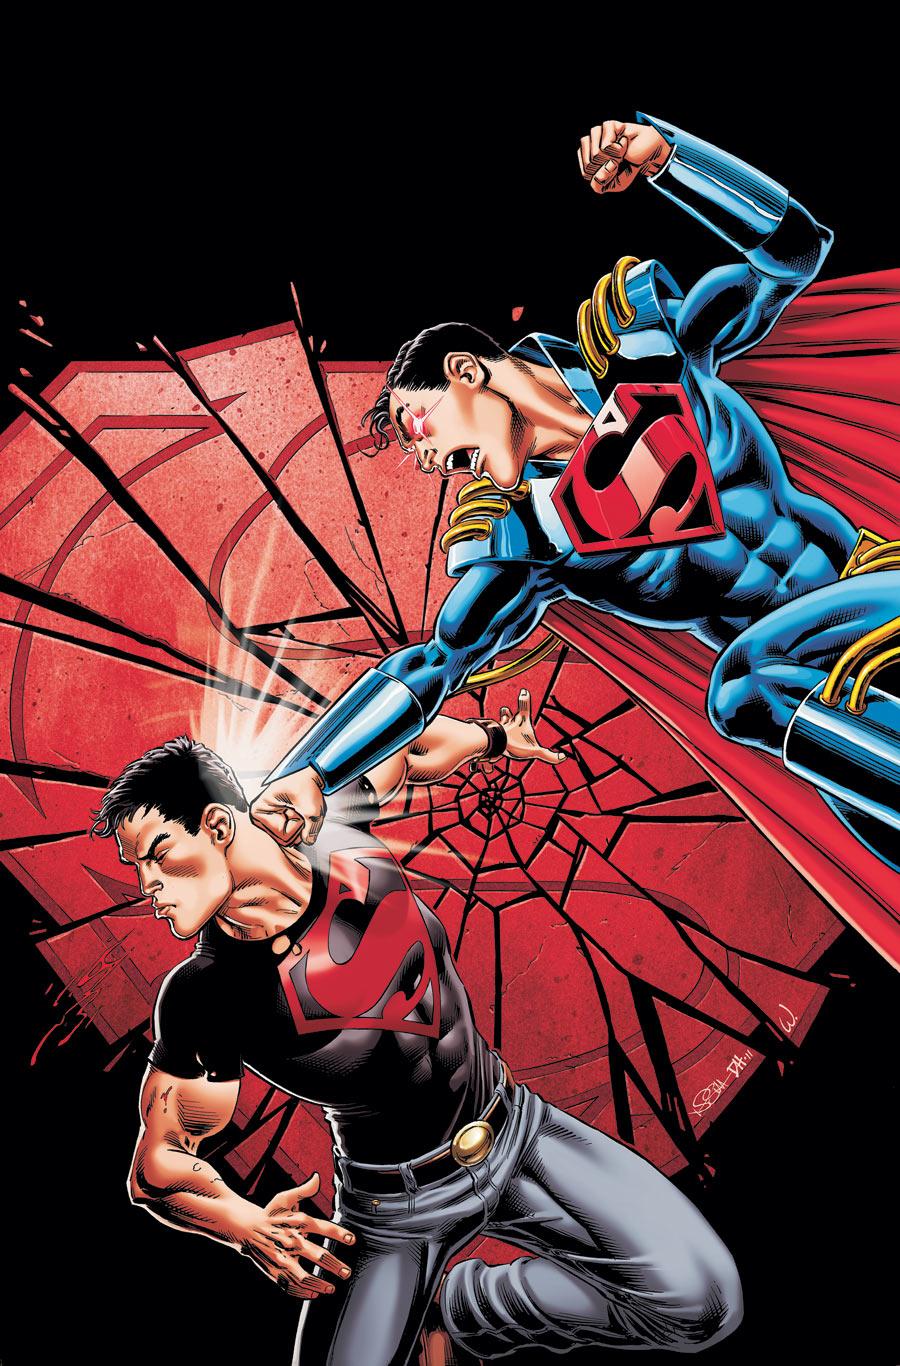 TEEN TITANS #98 Color COVER ART Superboy-Prime by DRHazlewood